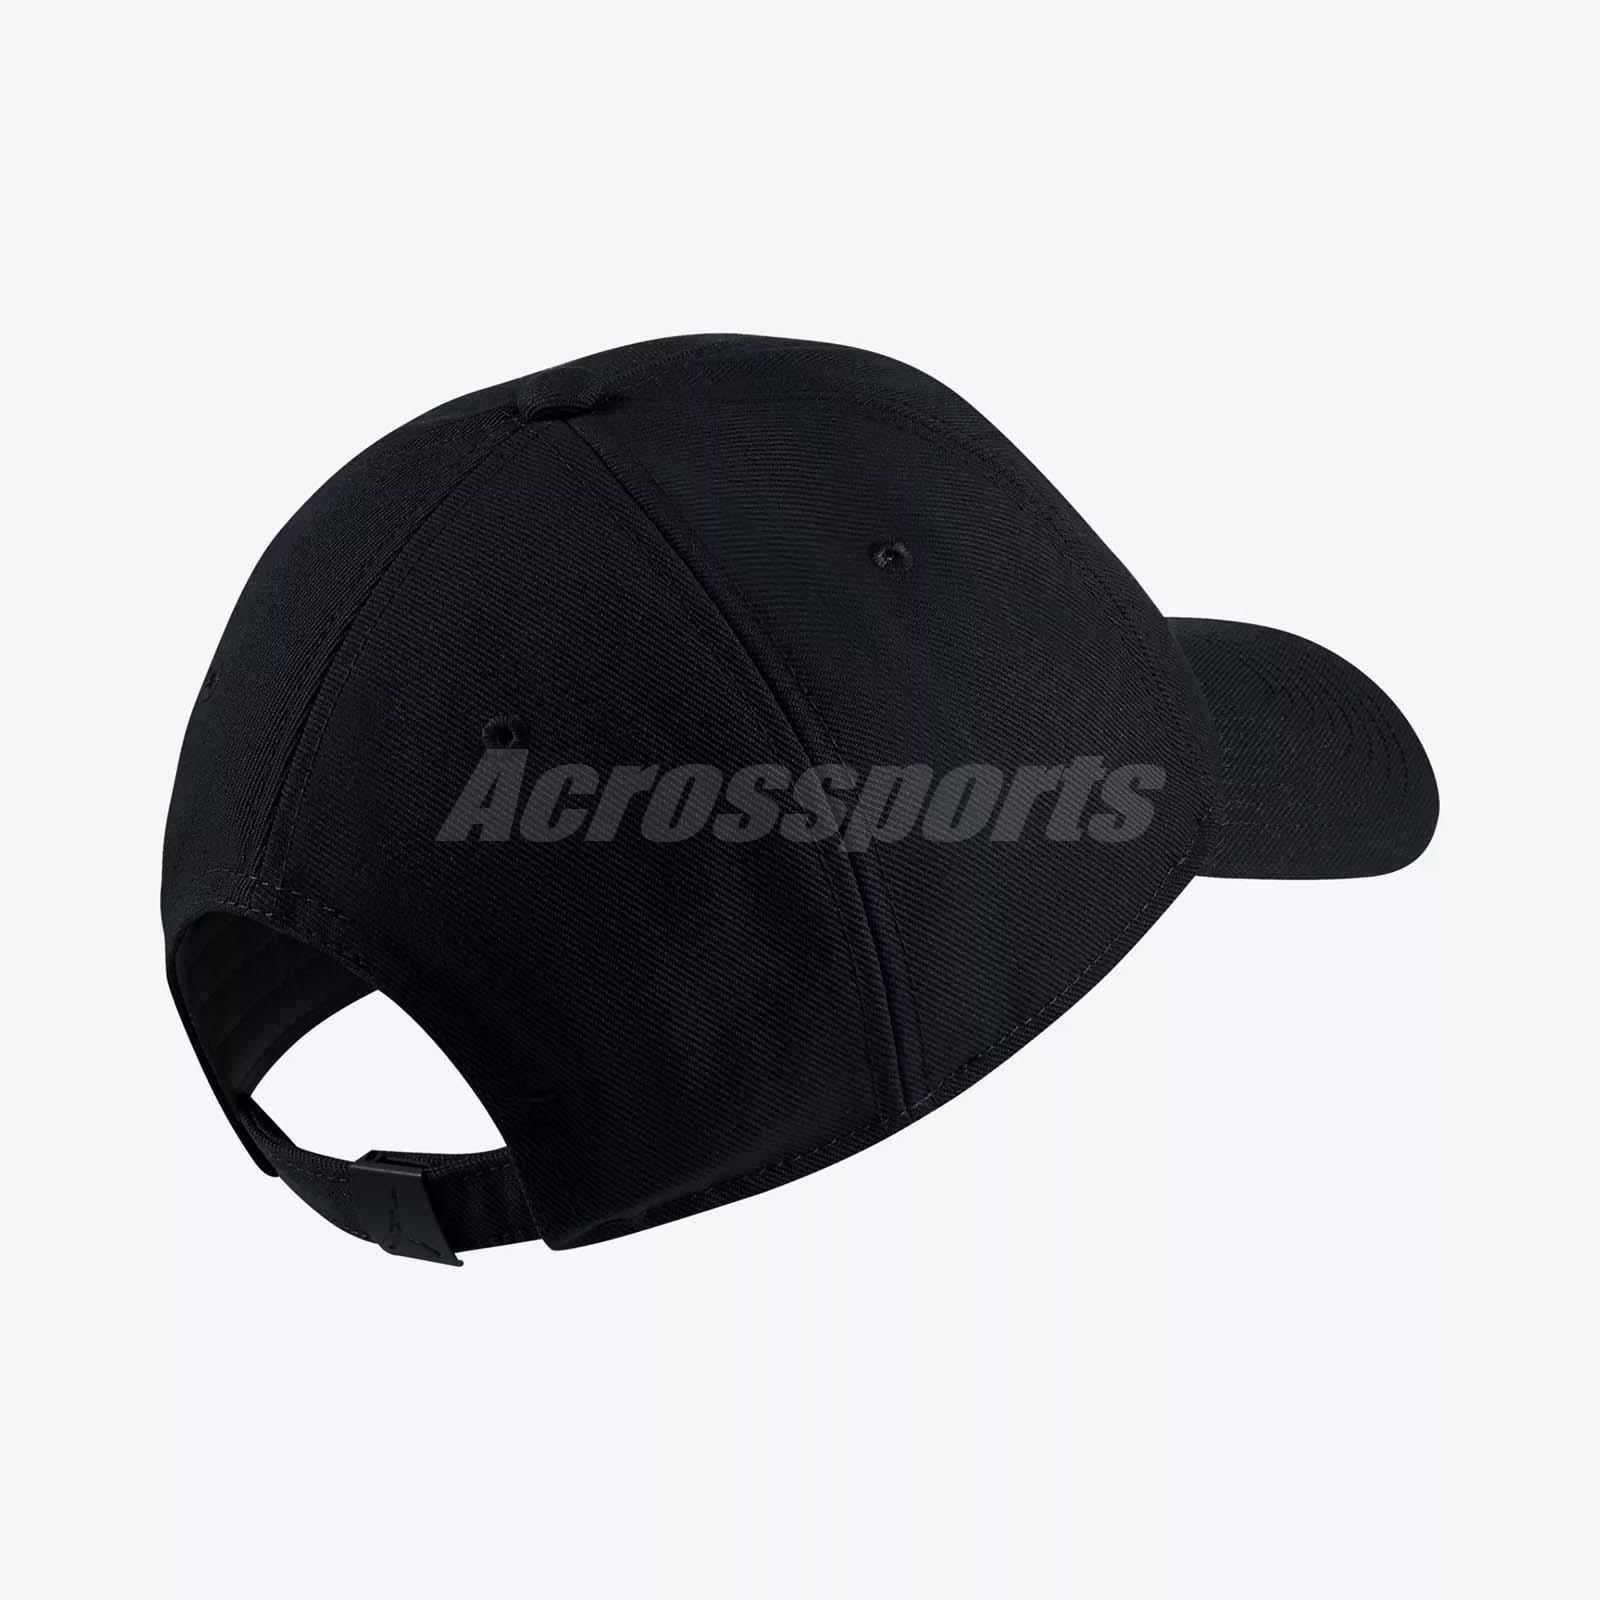 5228b02bf5d Nike Jordan Jumpman Floppy H86 Adjustable Hat Cap Heritage Gym Black ...